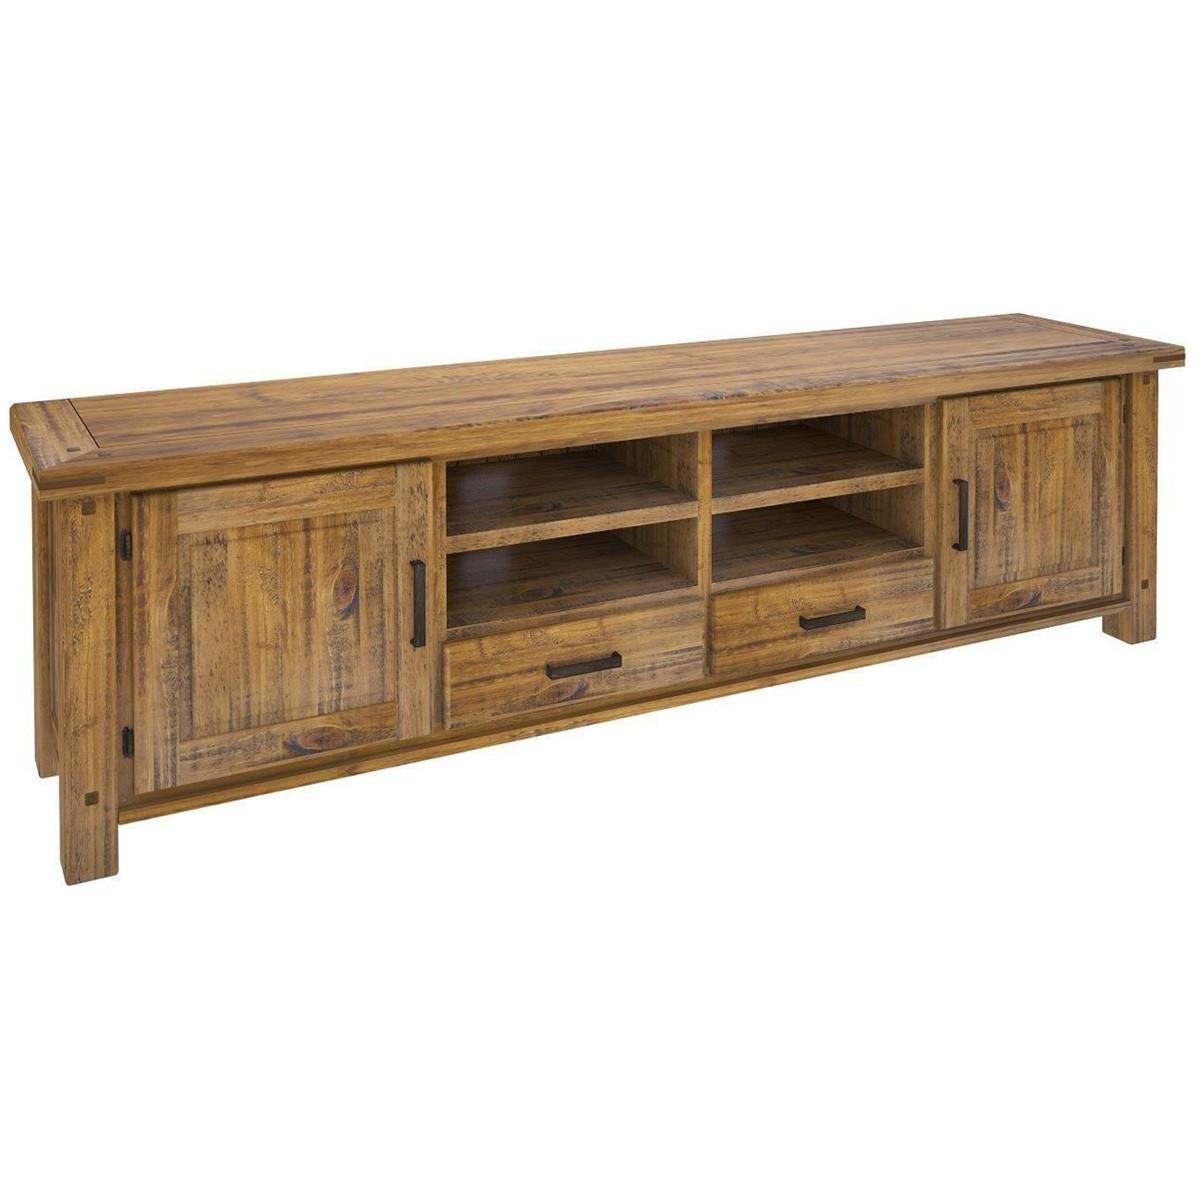 Serafin Rustic Pine Timber 2 Door 2 Drawer TV Unit, 240cm